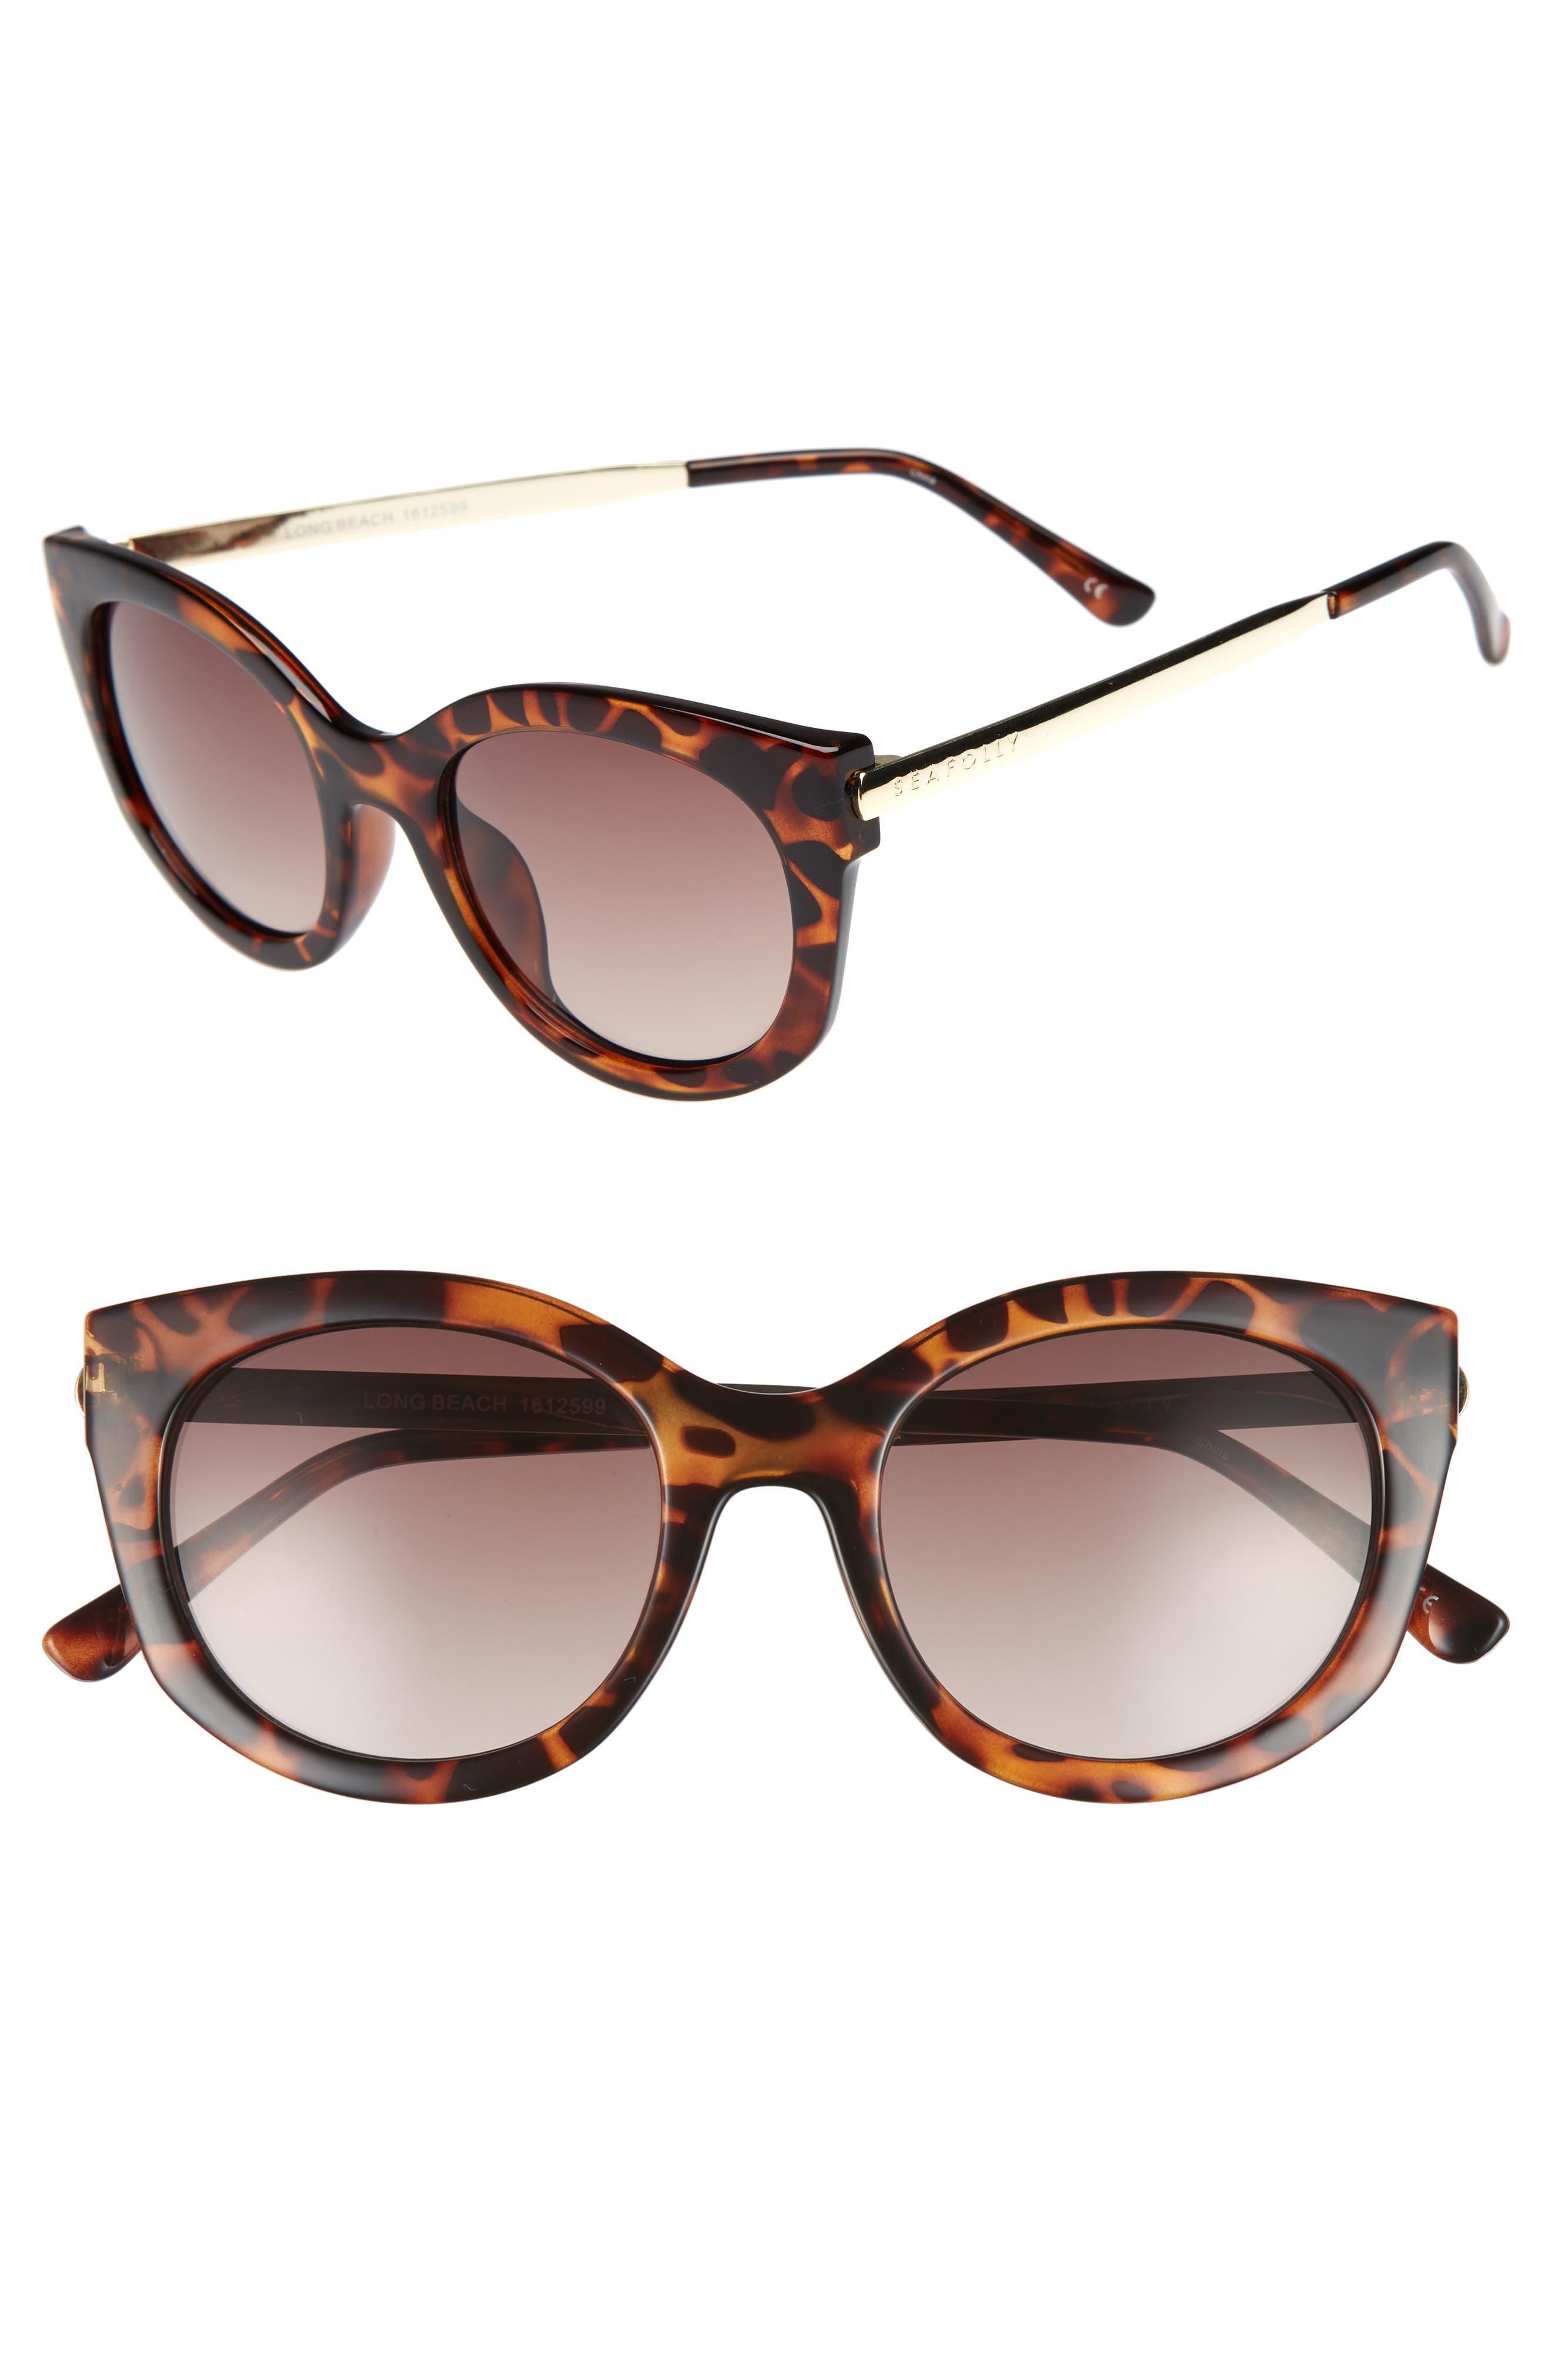 Del Mar 49Mm Tortiseshell Aviator Sunglasses - Dark Tort